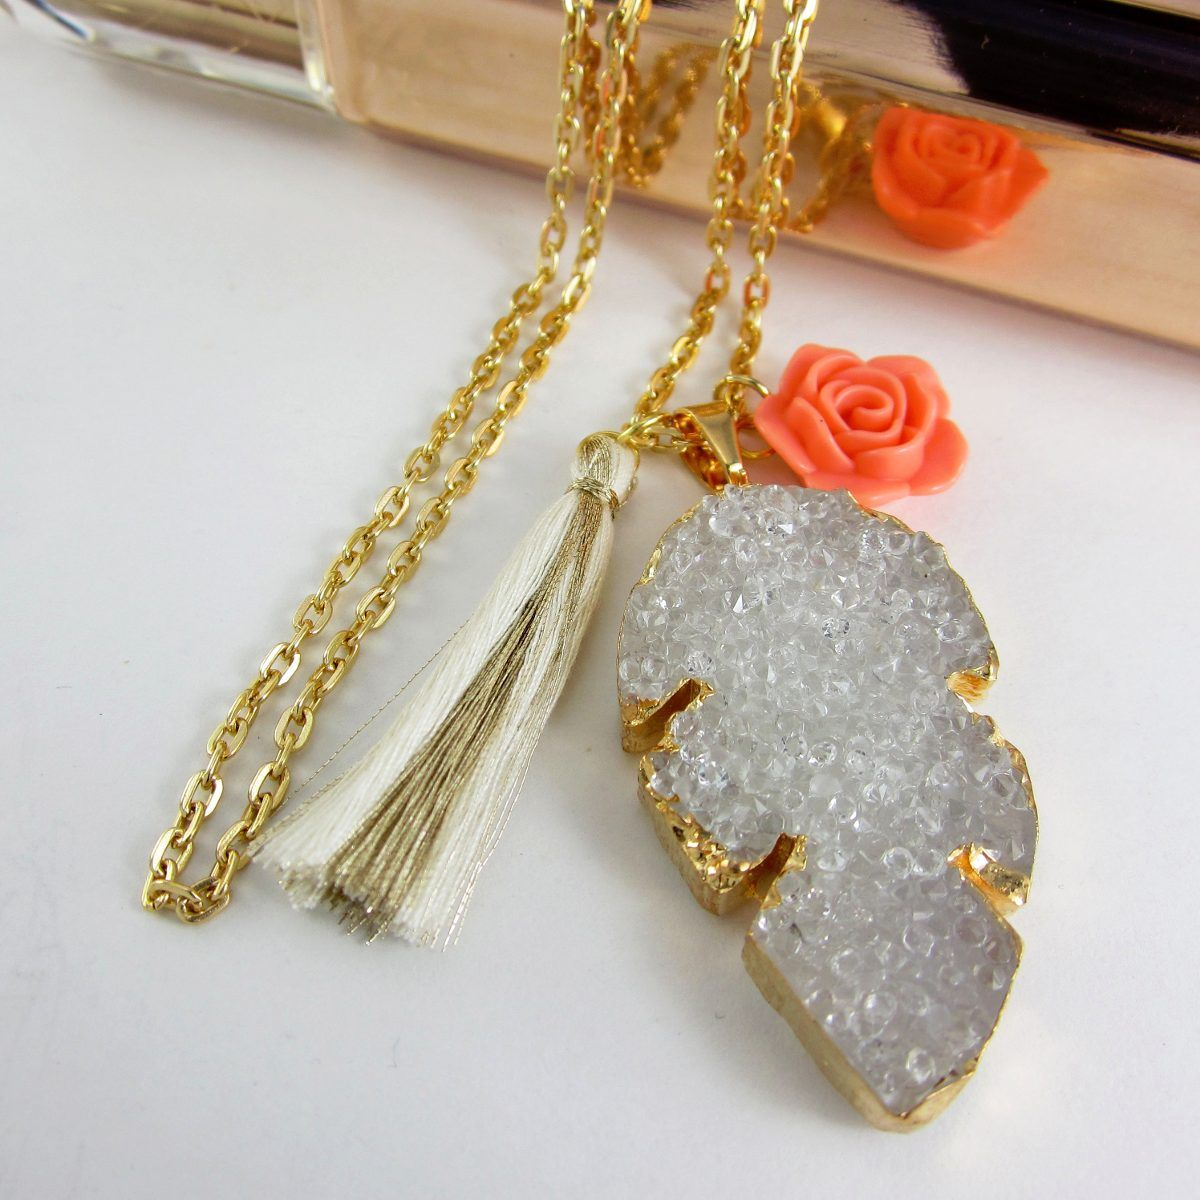 Collares mujer collar cadena ba o oro drusa piedras for Accesorios bano piedra